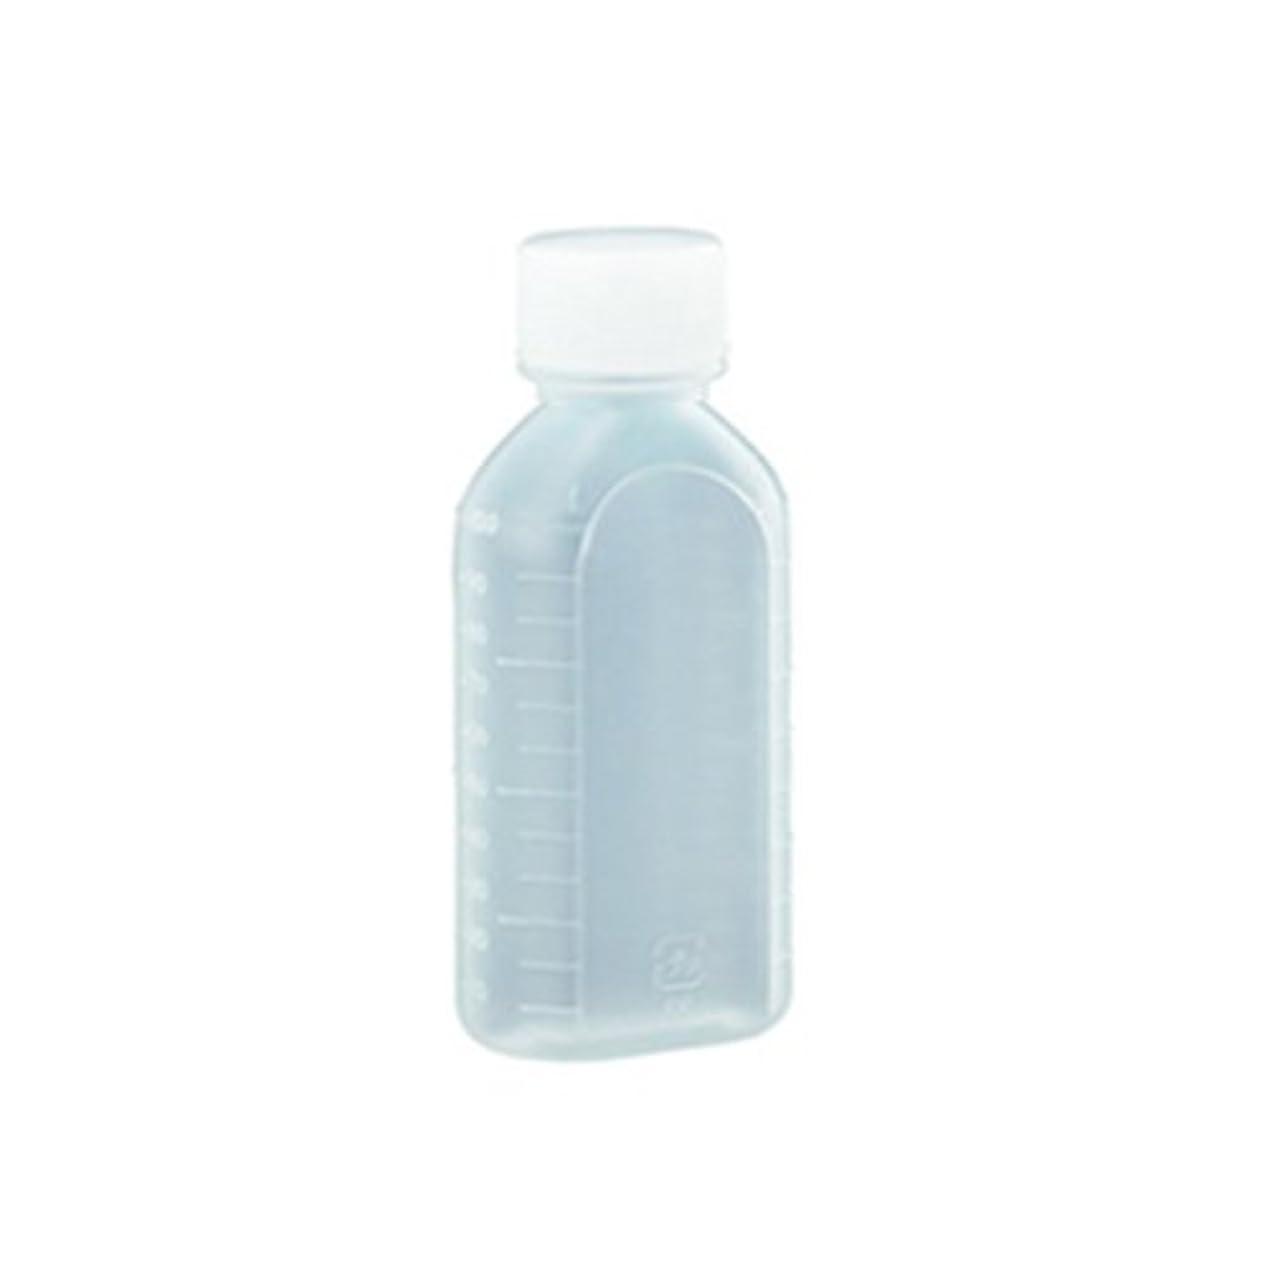 B型投薬瓶 白 (60ml) 1本